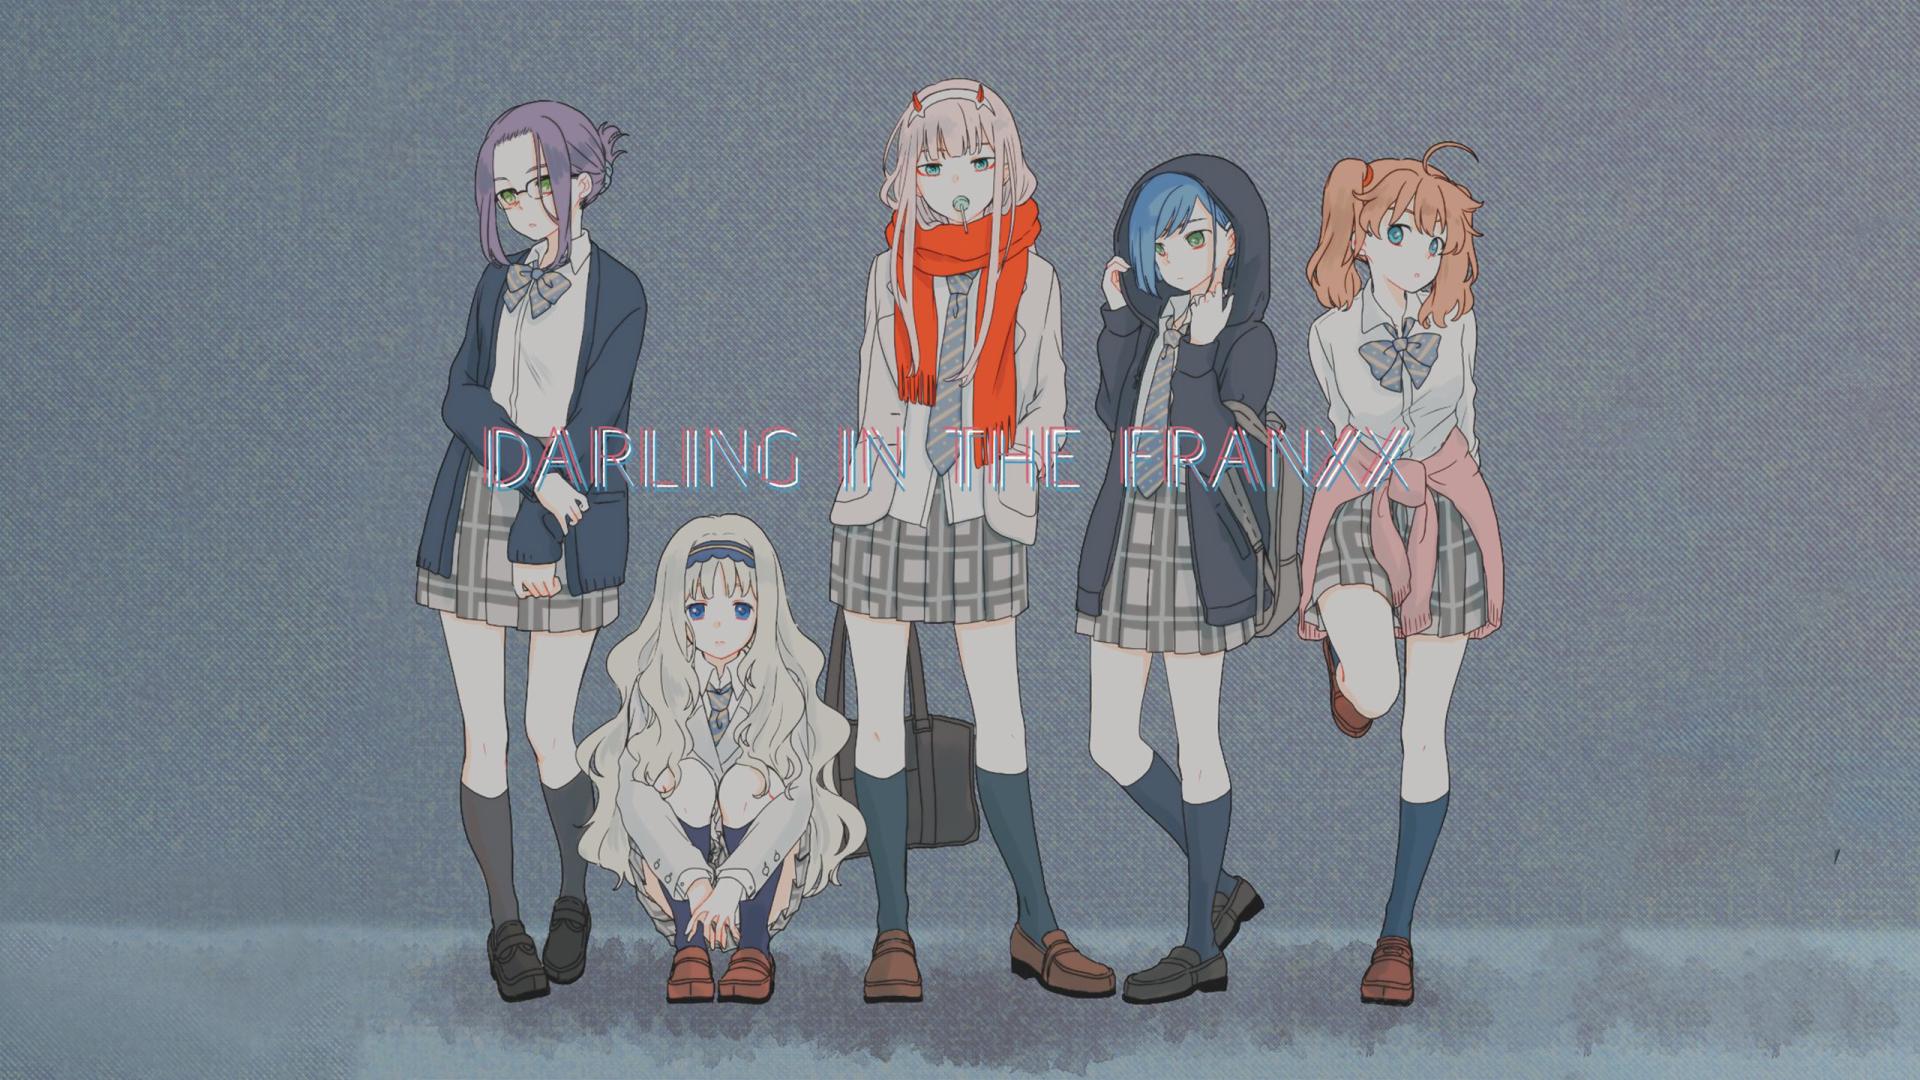 Anime 1920x1080 Darling in the FranXX anime girls Ichigo (Darling in the FranXX) Zero Two (Darling in the FranXX) Code:196 (Ikuno) Code:556 (Kokoro) Code:390 (Miku)